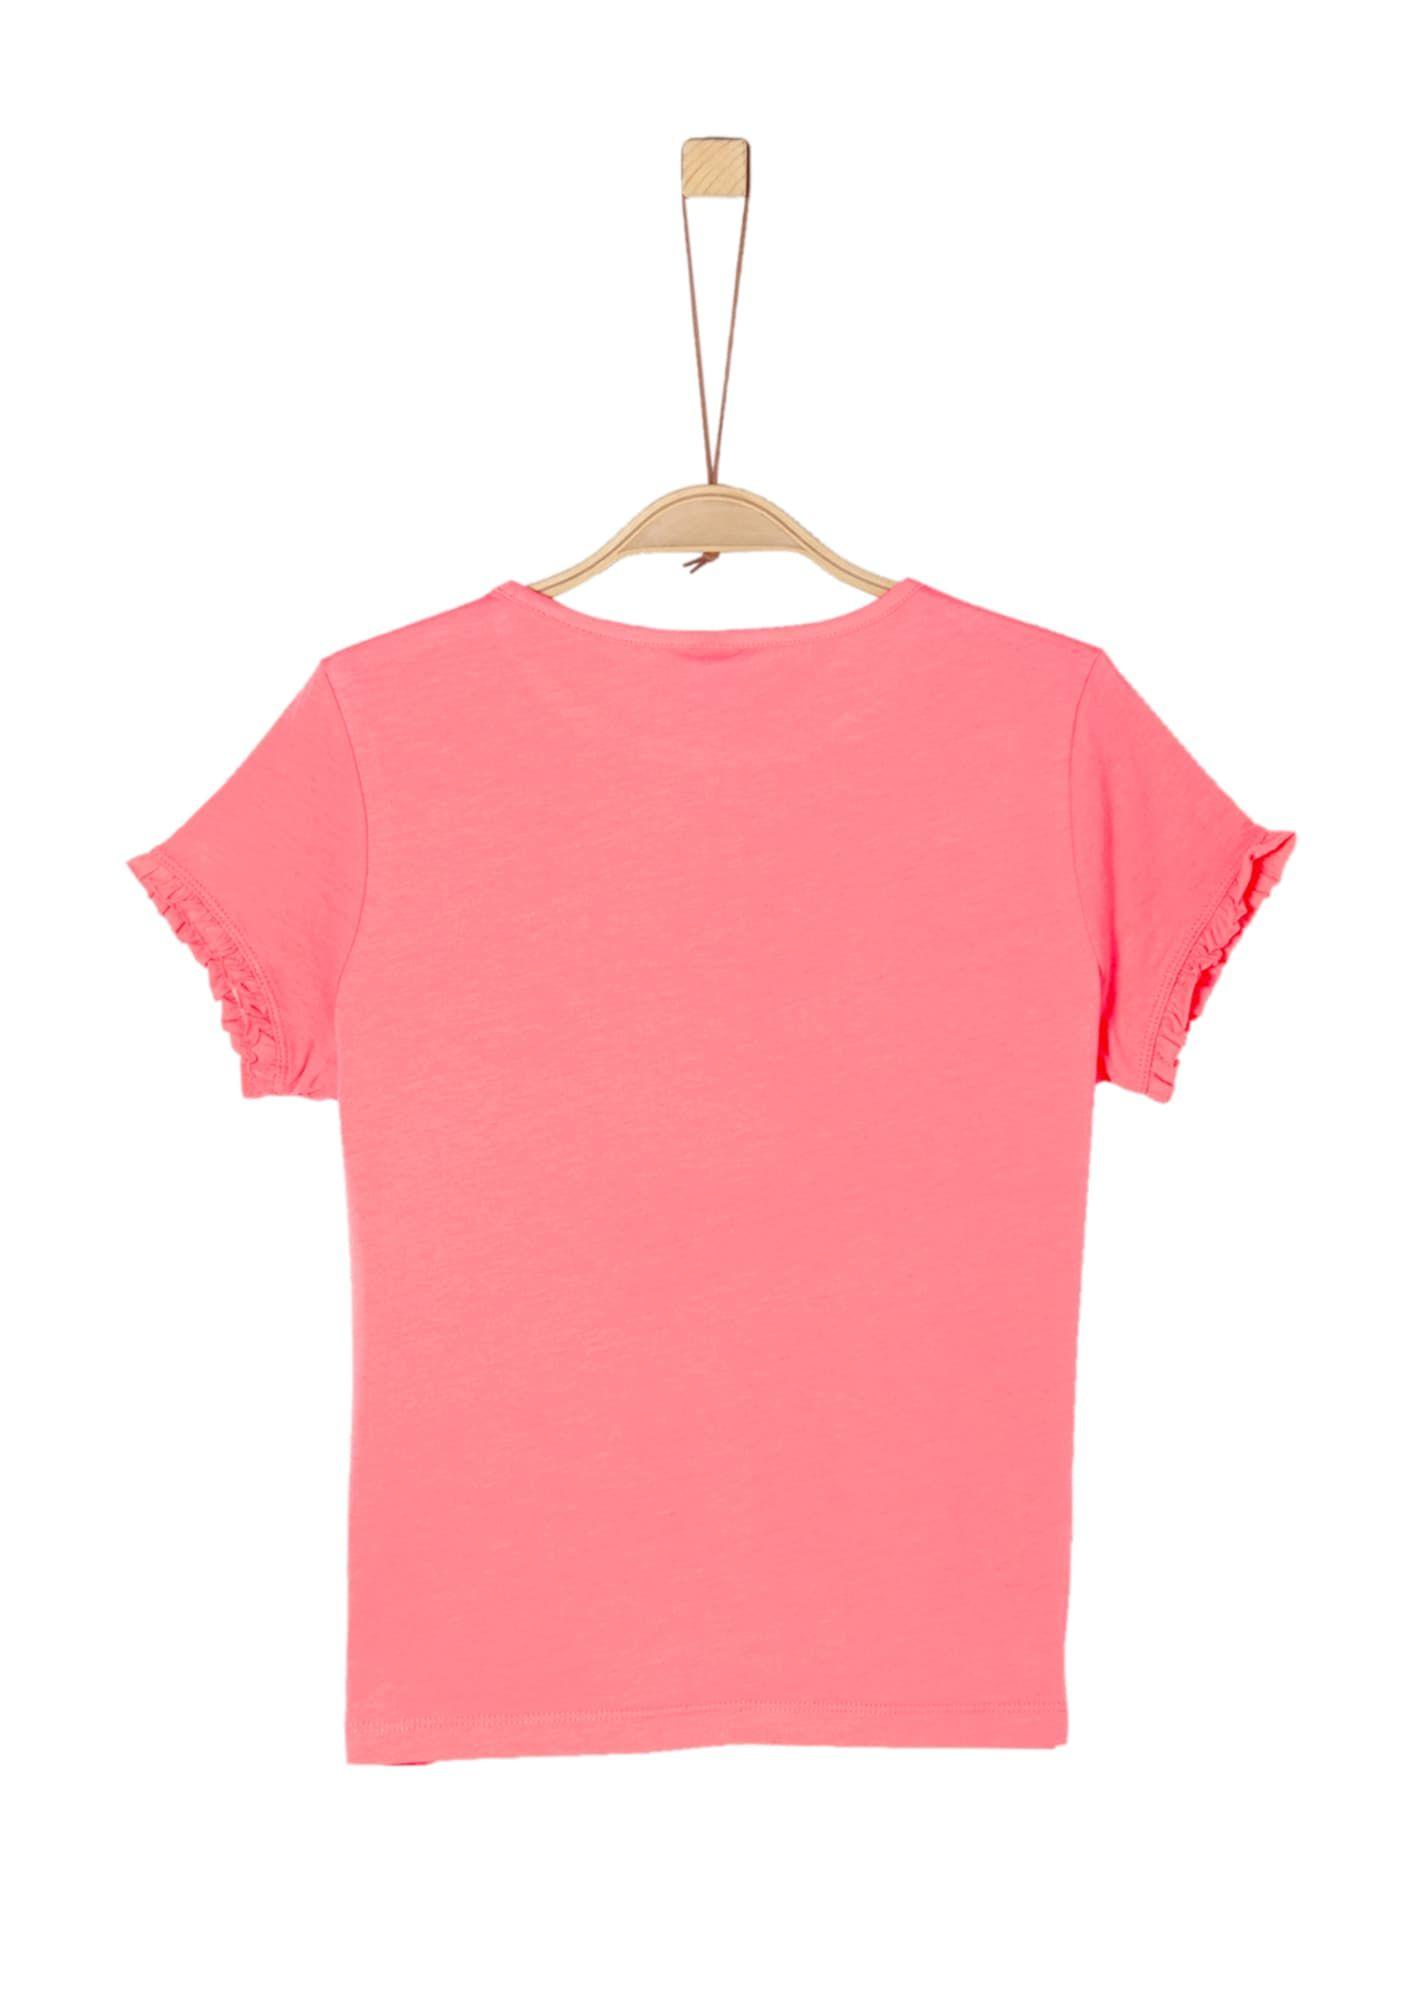 S Oliver Junior T Shirt Madchen Altrosa Hellrot Grosse Xl Shirts T Shirt Umstandsmode